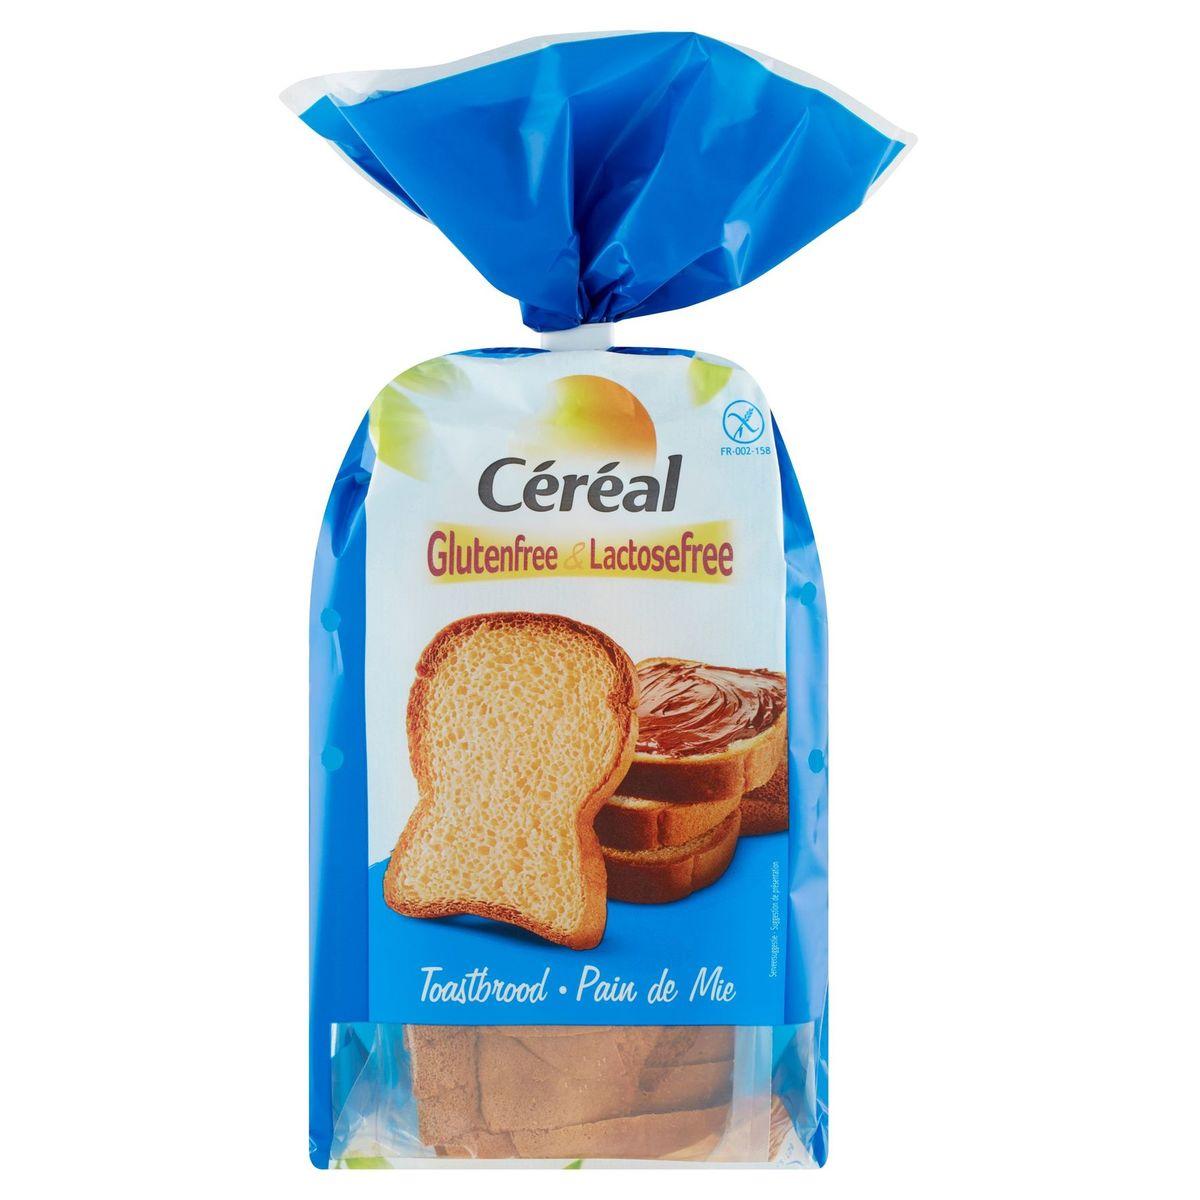 Céréal Glutenfree & Lactosefree Toastbrood 350 g